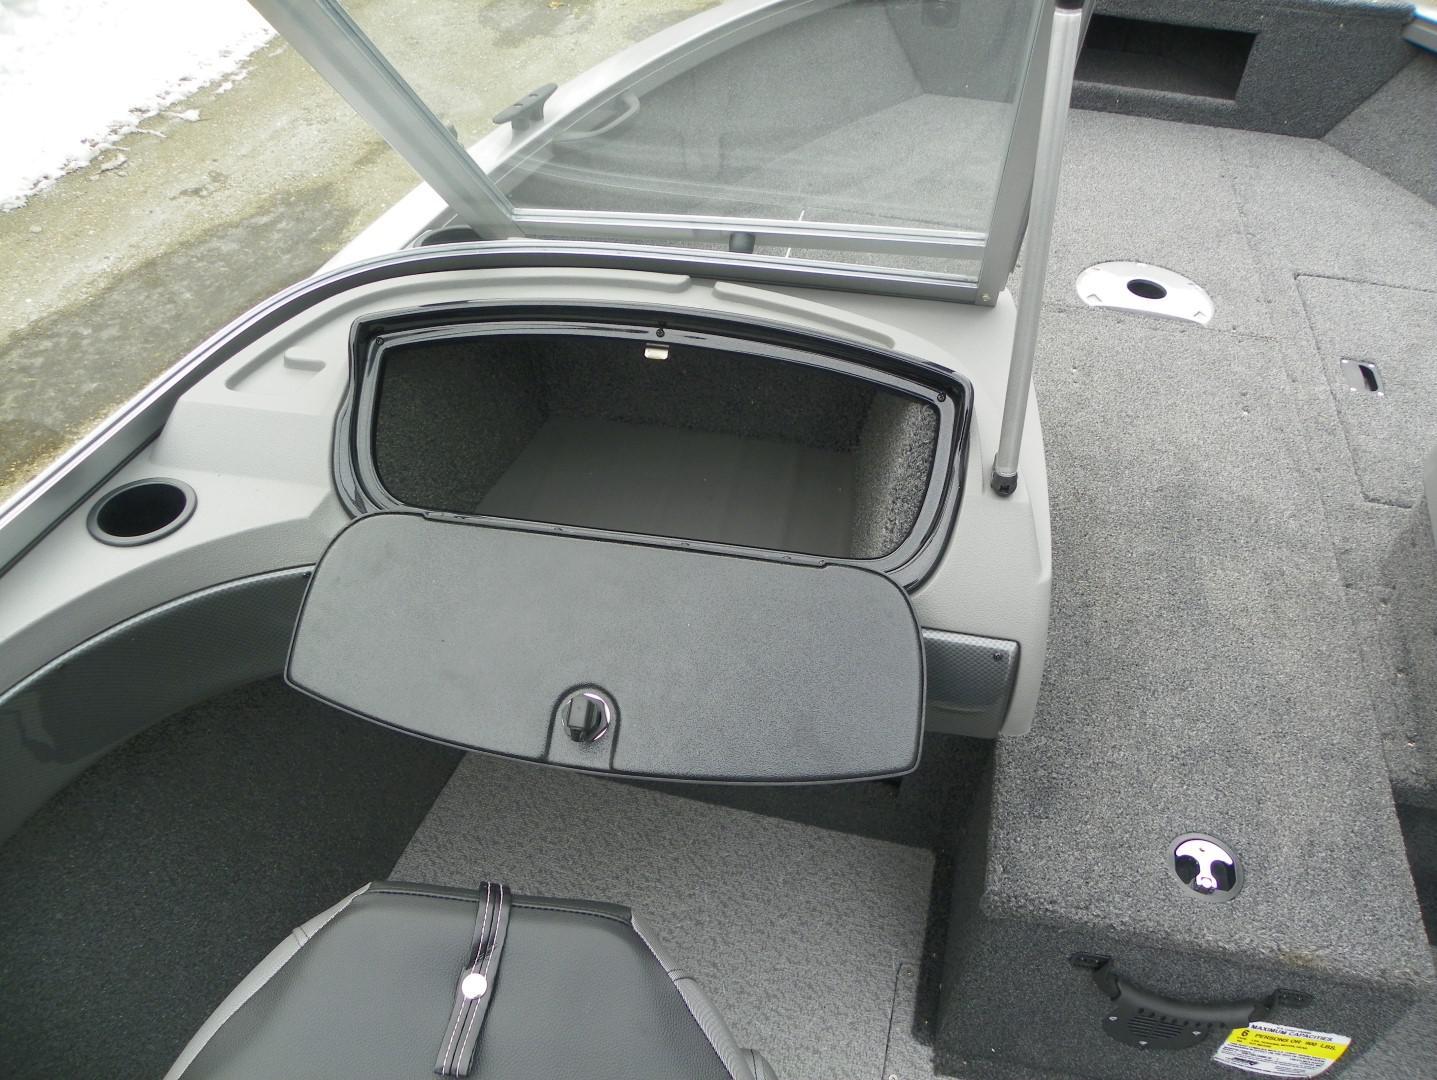 2019 Crestliner 1650 Fish Hawk SE WT W/ Mercury 60 for sale in